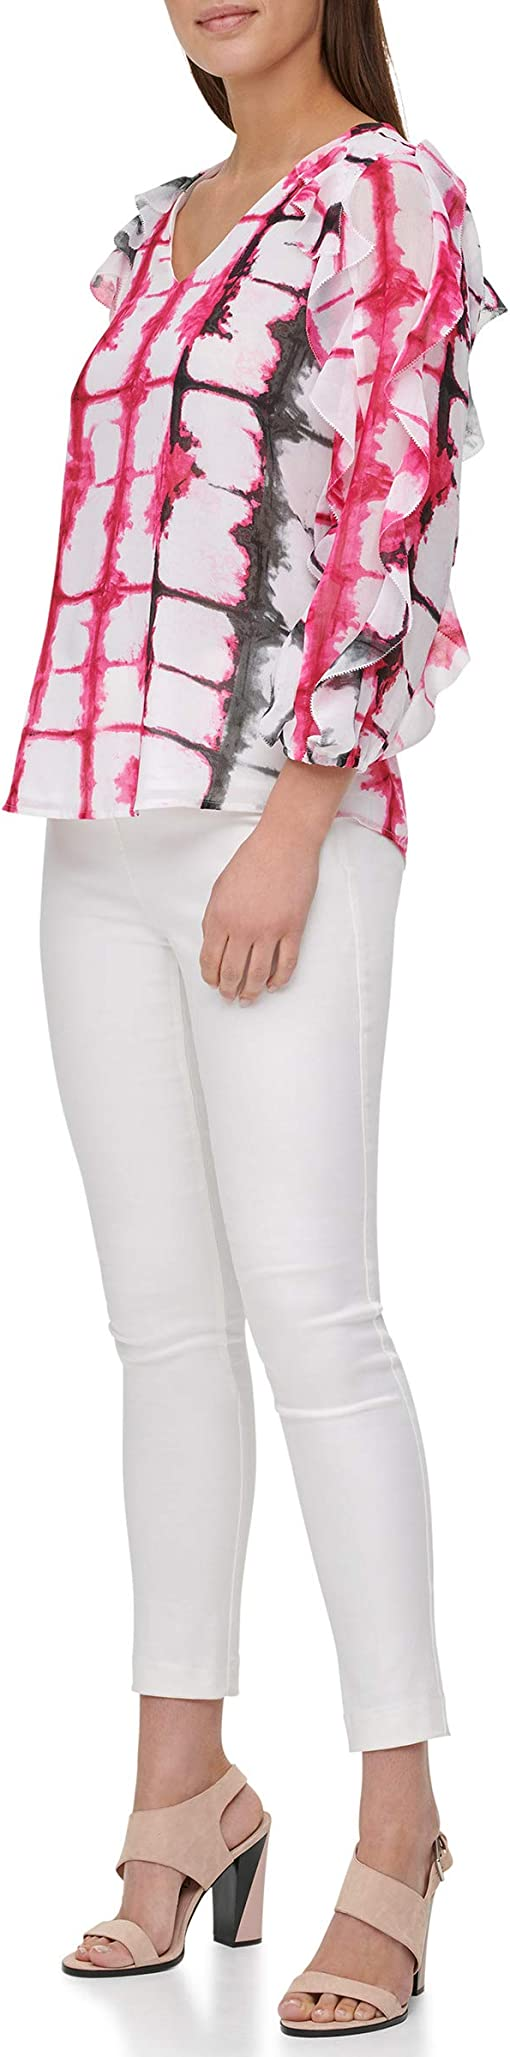 White/Hibiscus